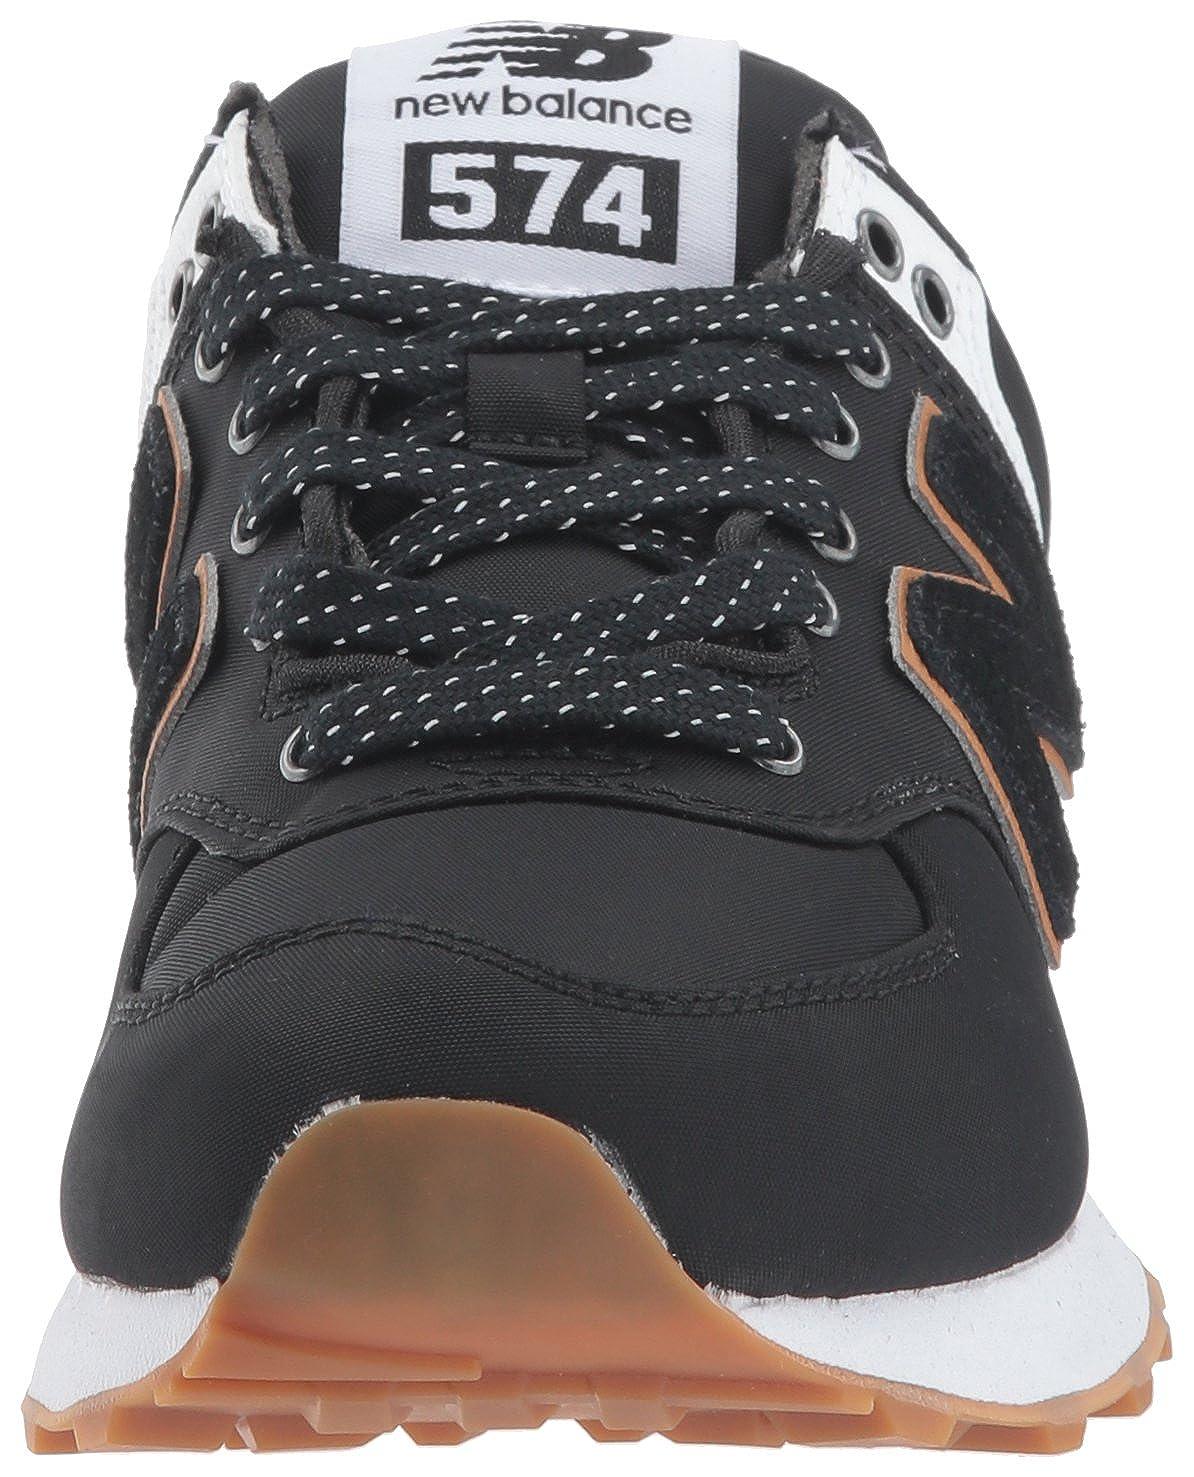 New Balance Damen 574v2 Turnschuhe 36,5 36,5 36,5 EU  e74ee8